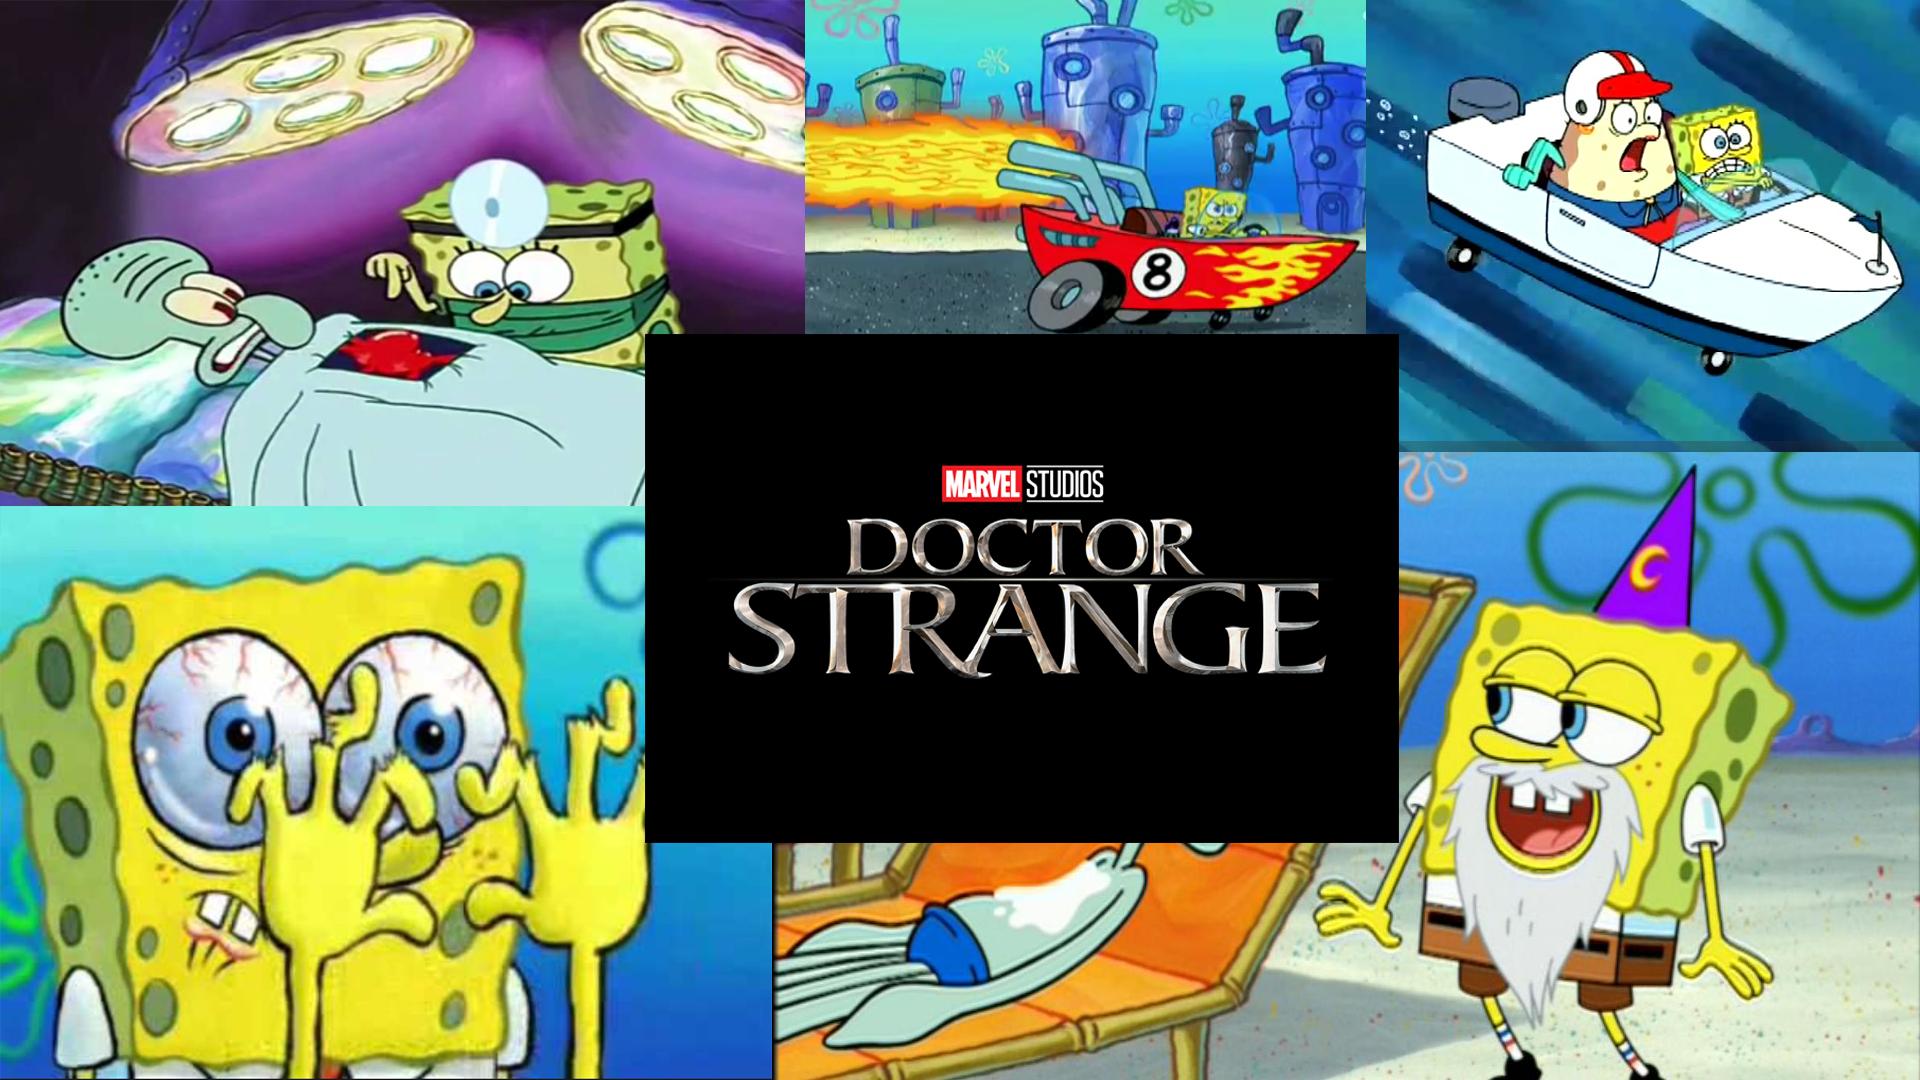 8 marvel studios doctor strange